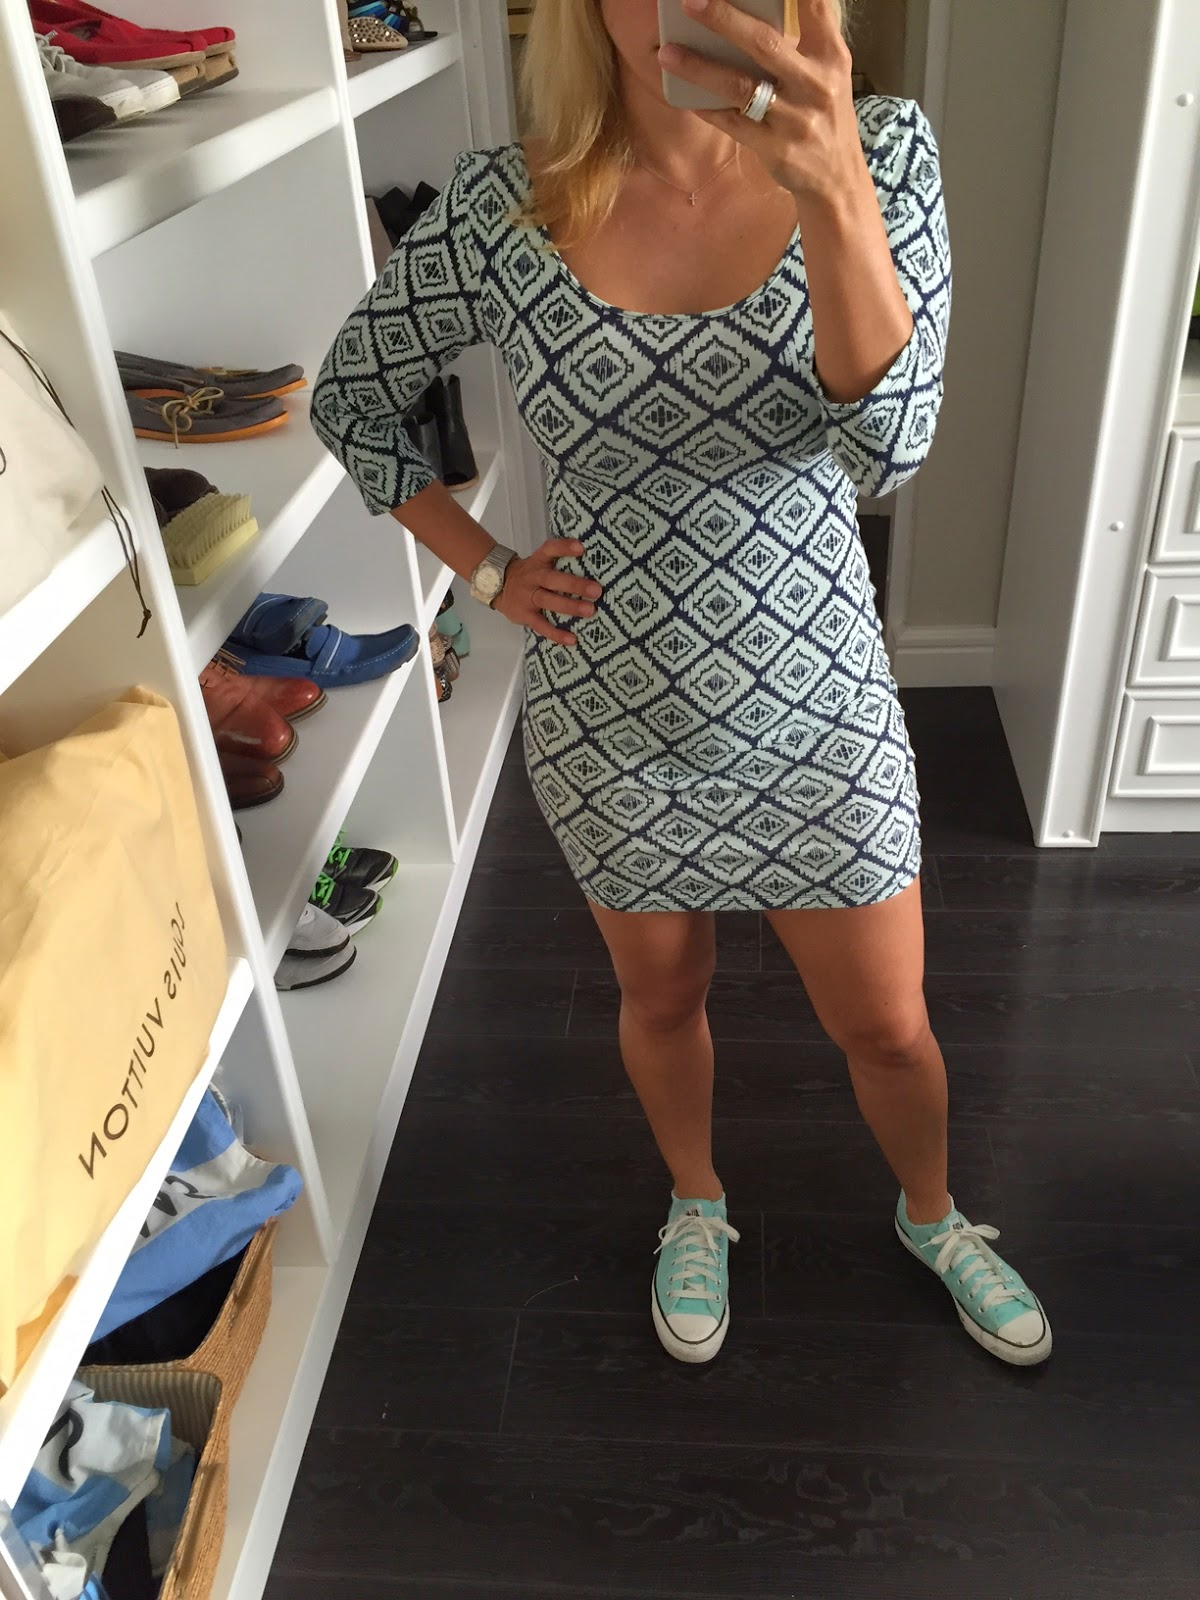 e19da55881 Vestido  Charlotte Russe Tenis  Converse Cardigan  Zara